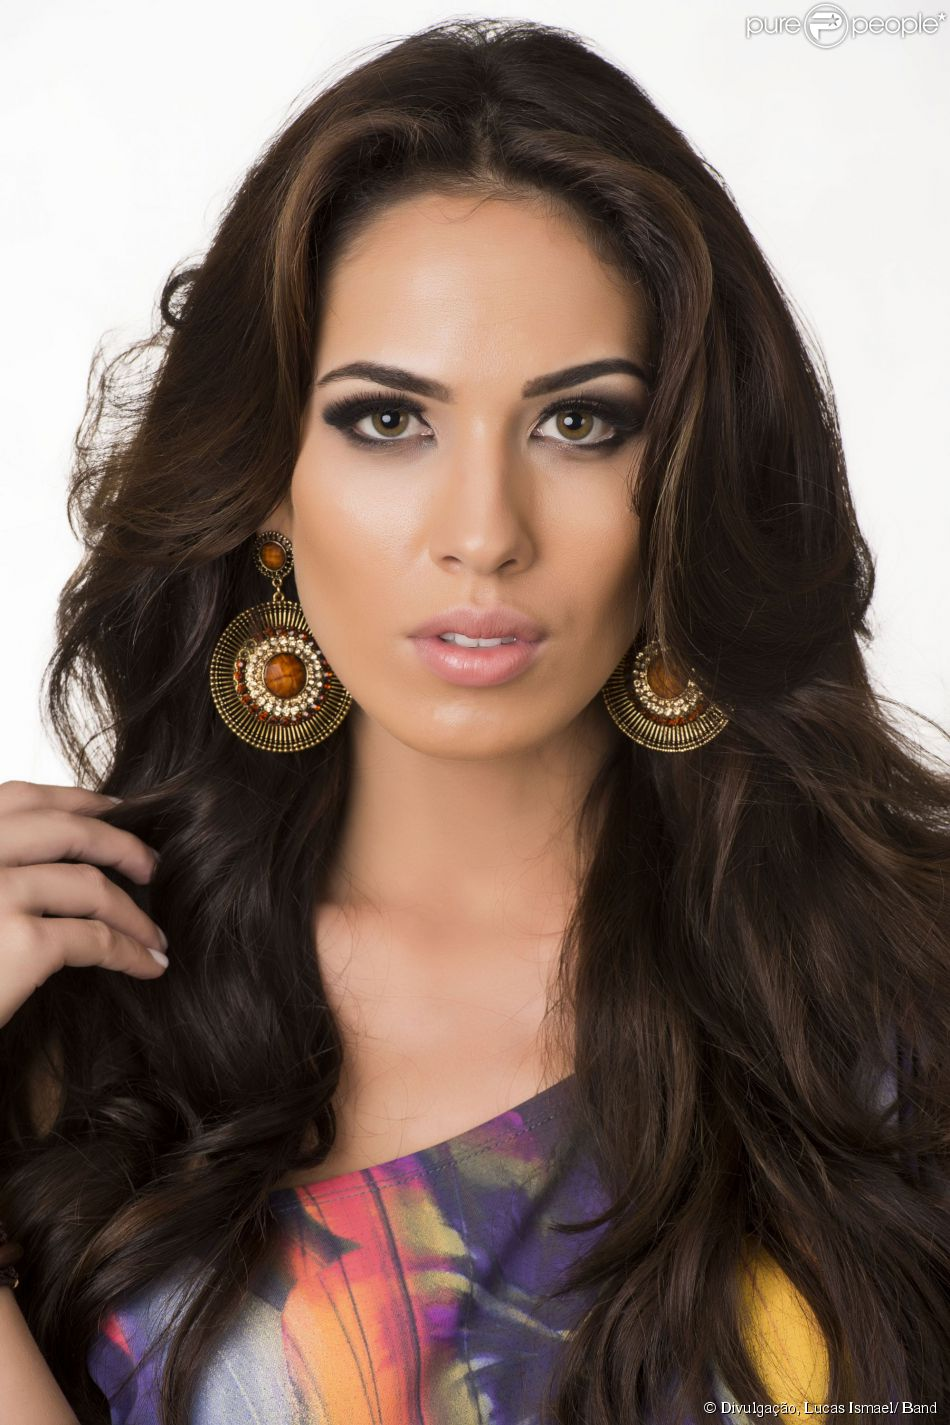 miss brasil terra 2016 vai participar (de novo) de miss sao paulo universo. Nklssrdt